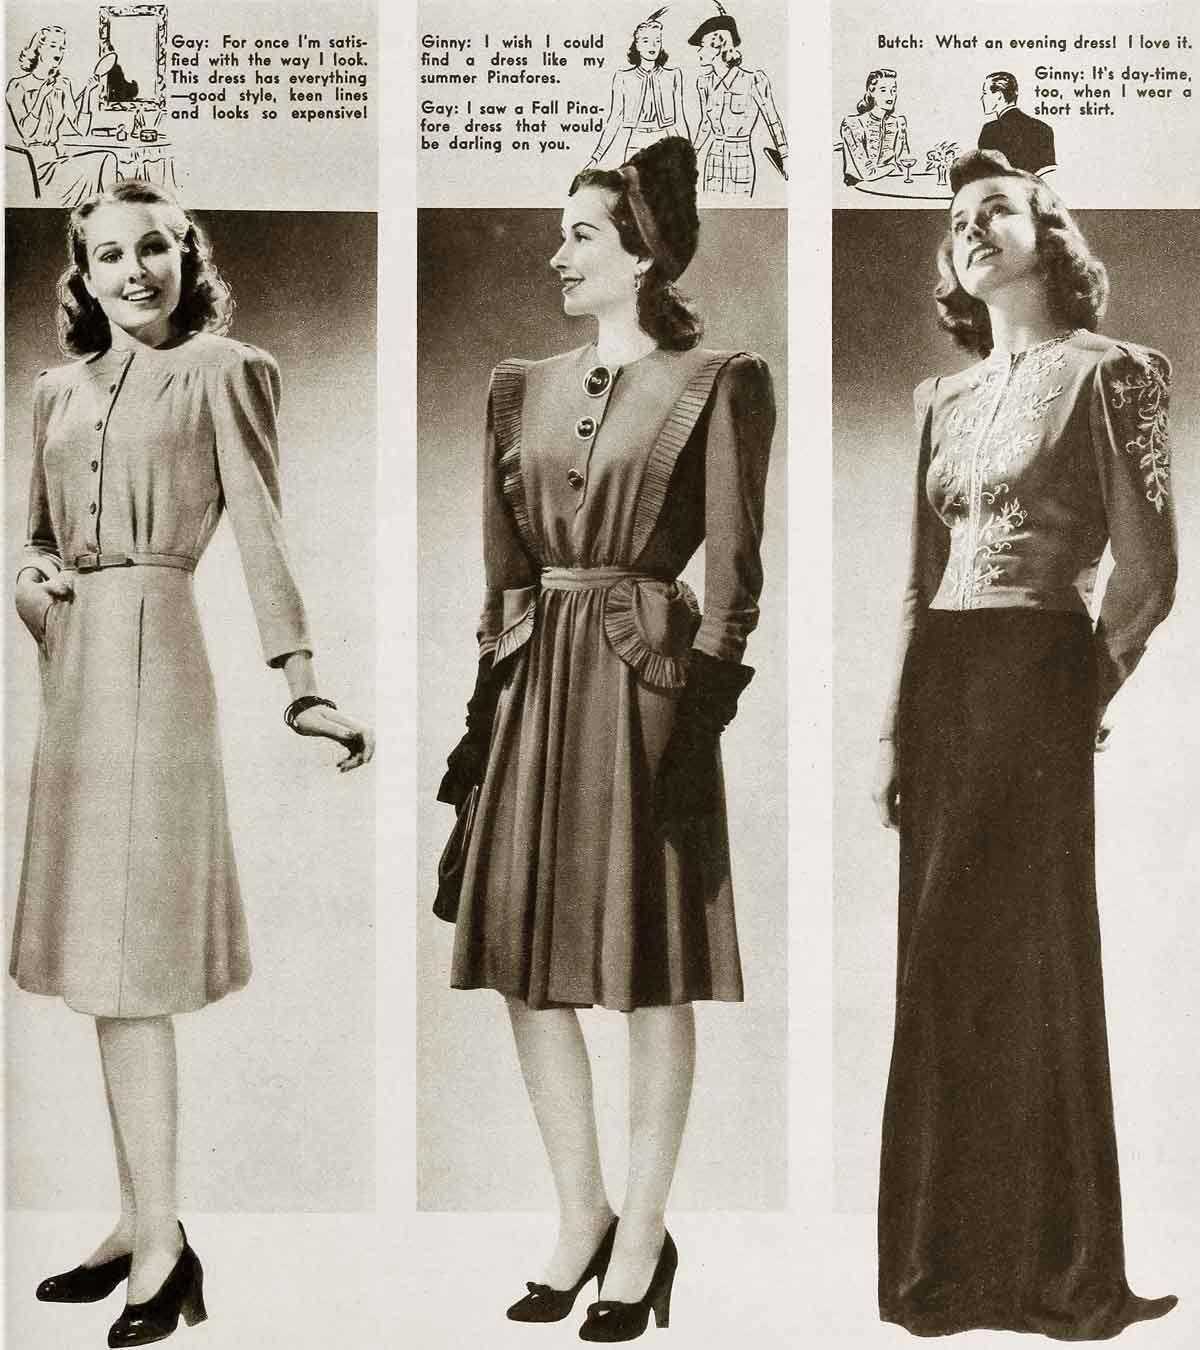 1940s Fashion – Cool Winter Styles (Glamour Daze)